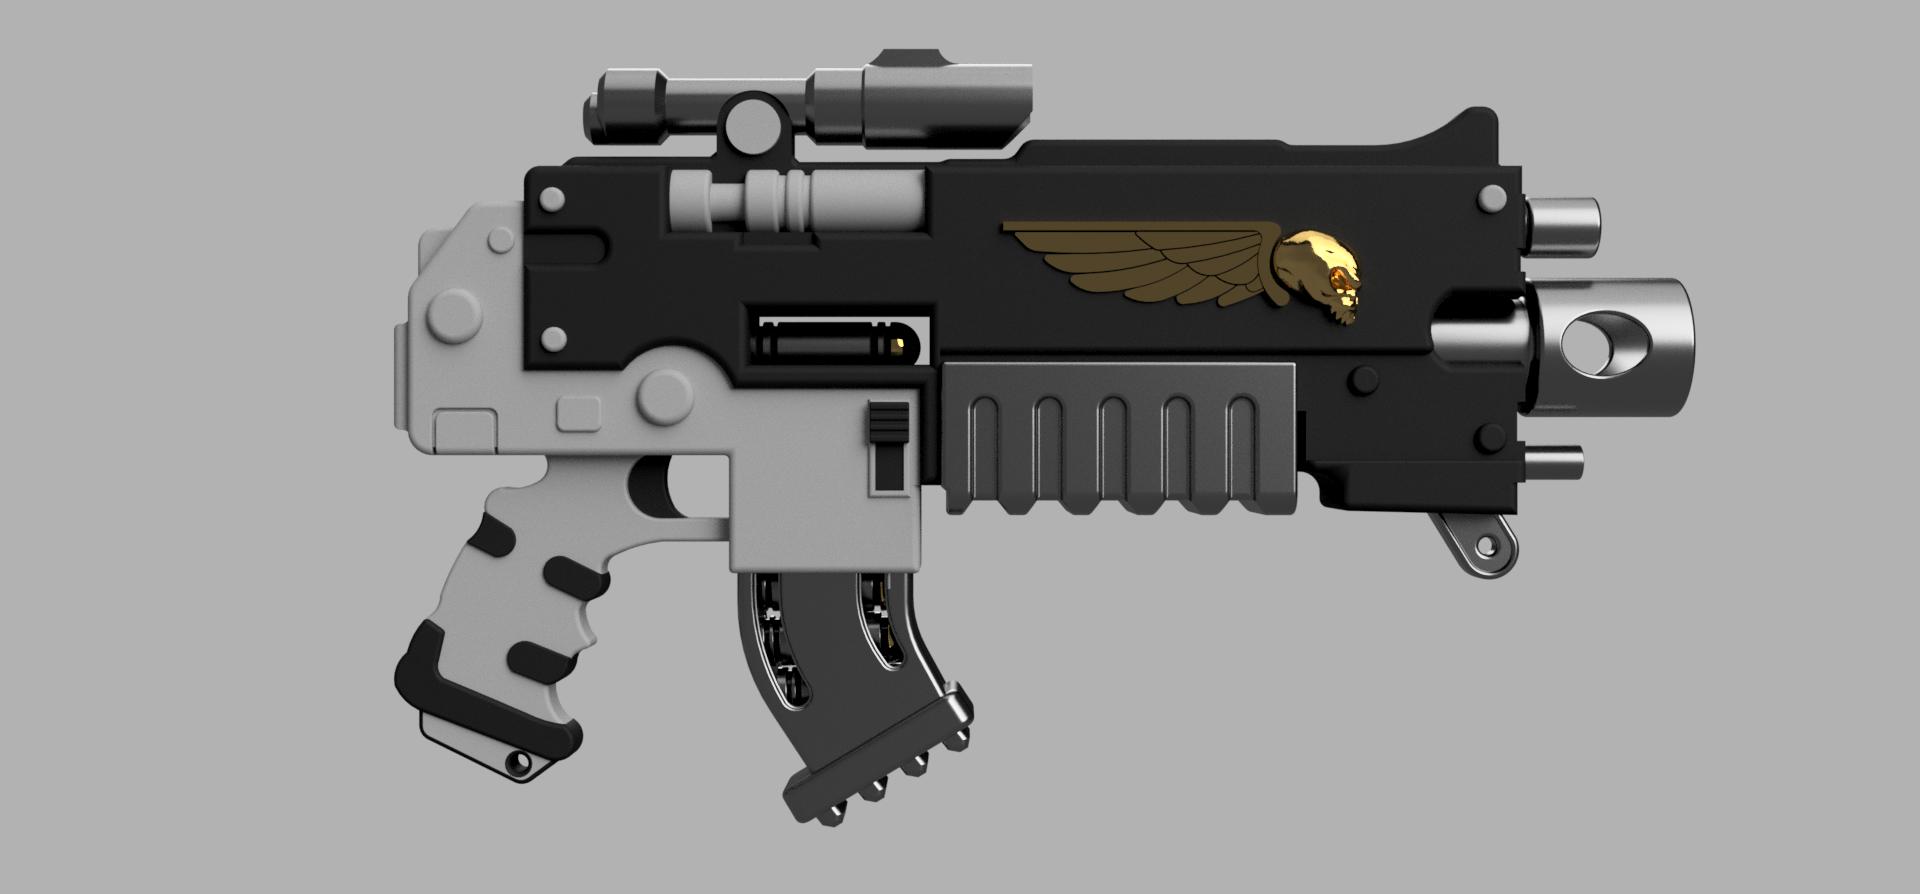 MkII Crawl Pattern Bolt Rifle v132.png